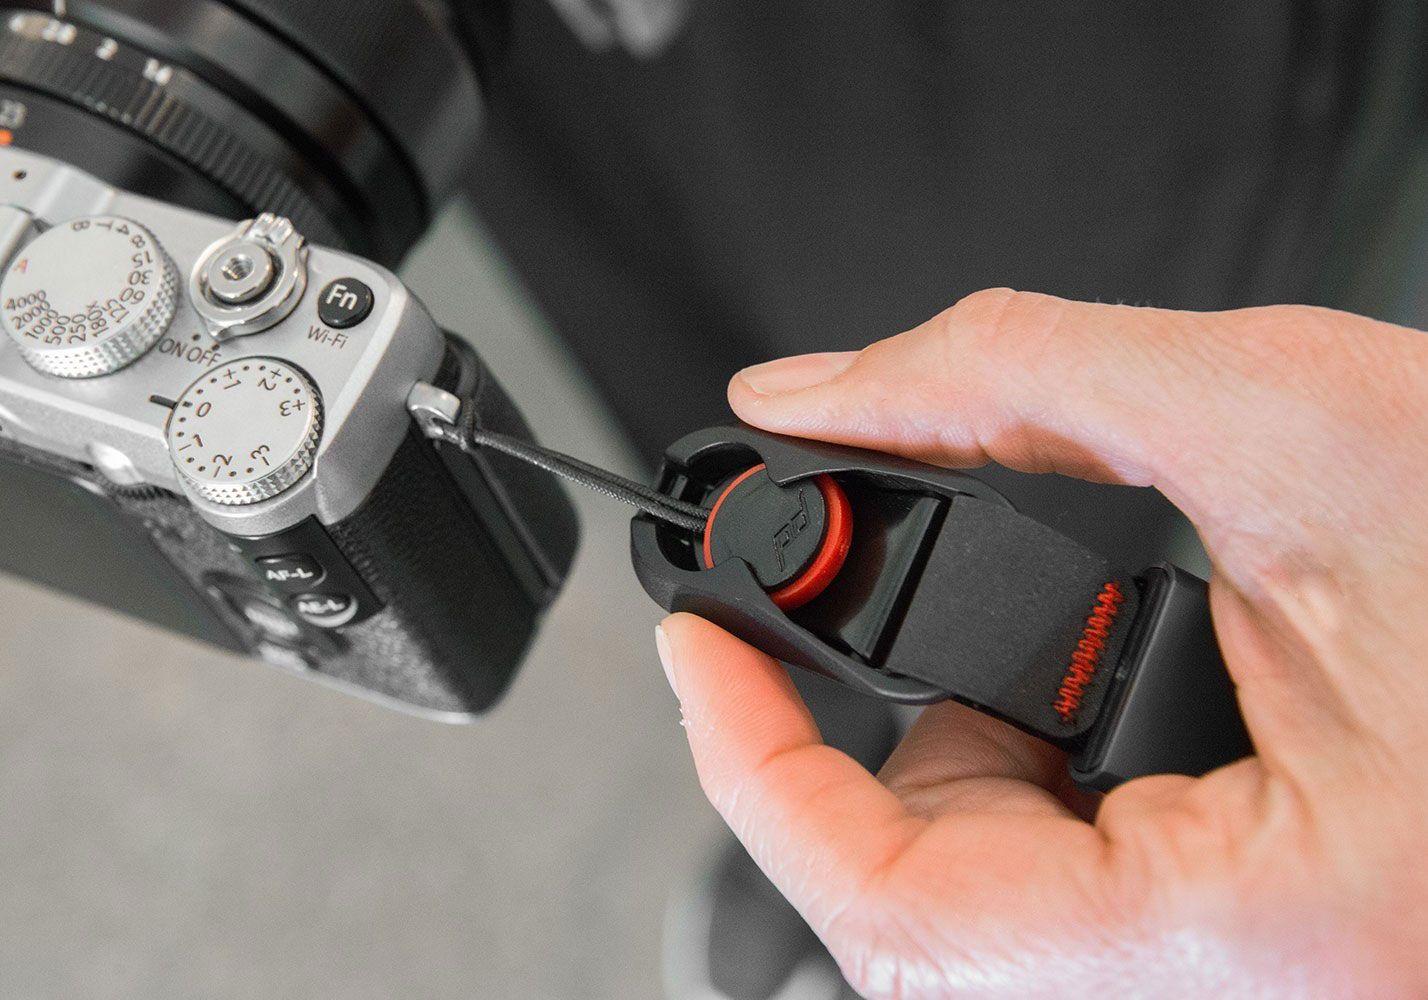 Peak Designs Cuff Camera Wrist Strap Cf Bl 3 Design Sll Bk Slide Lite Mirrorles Sling Black